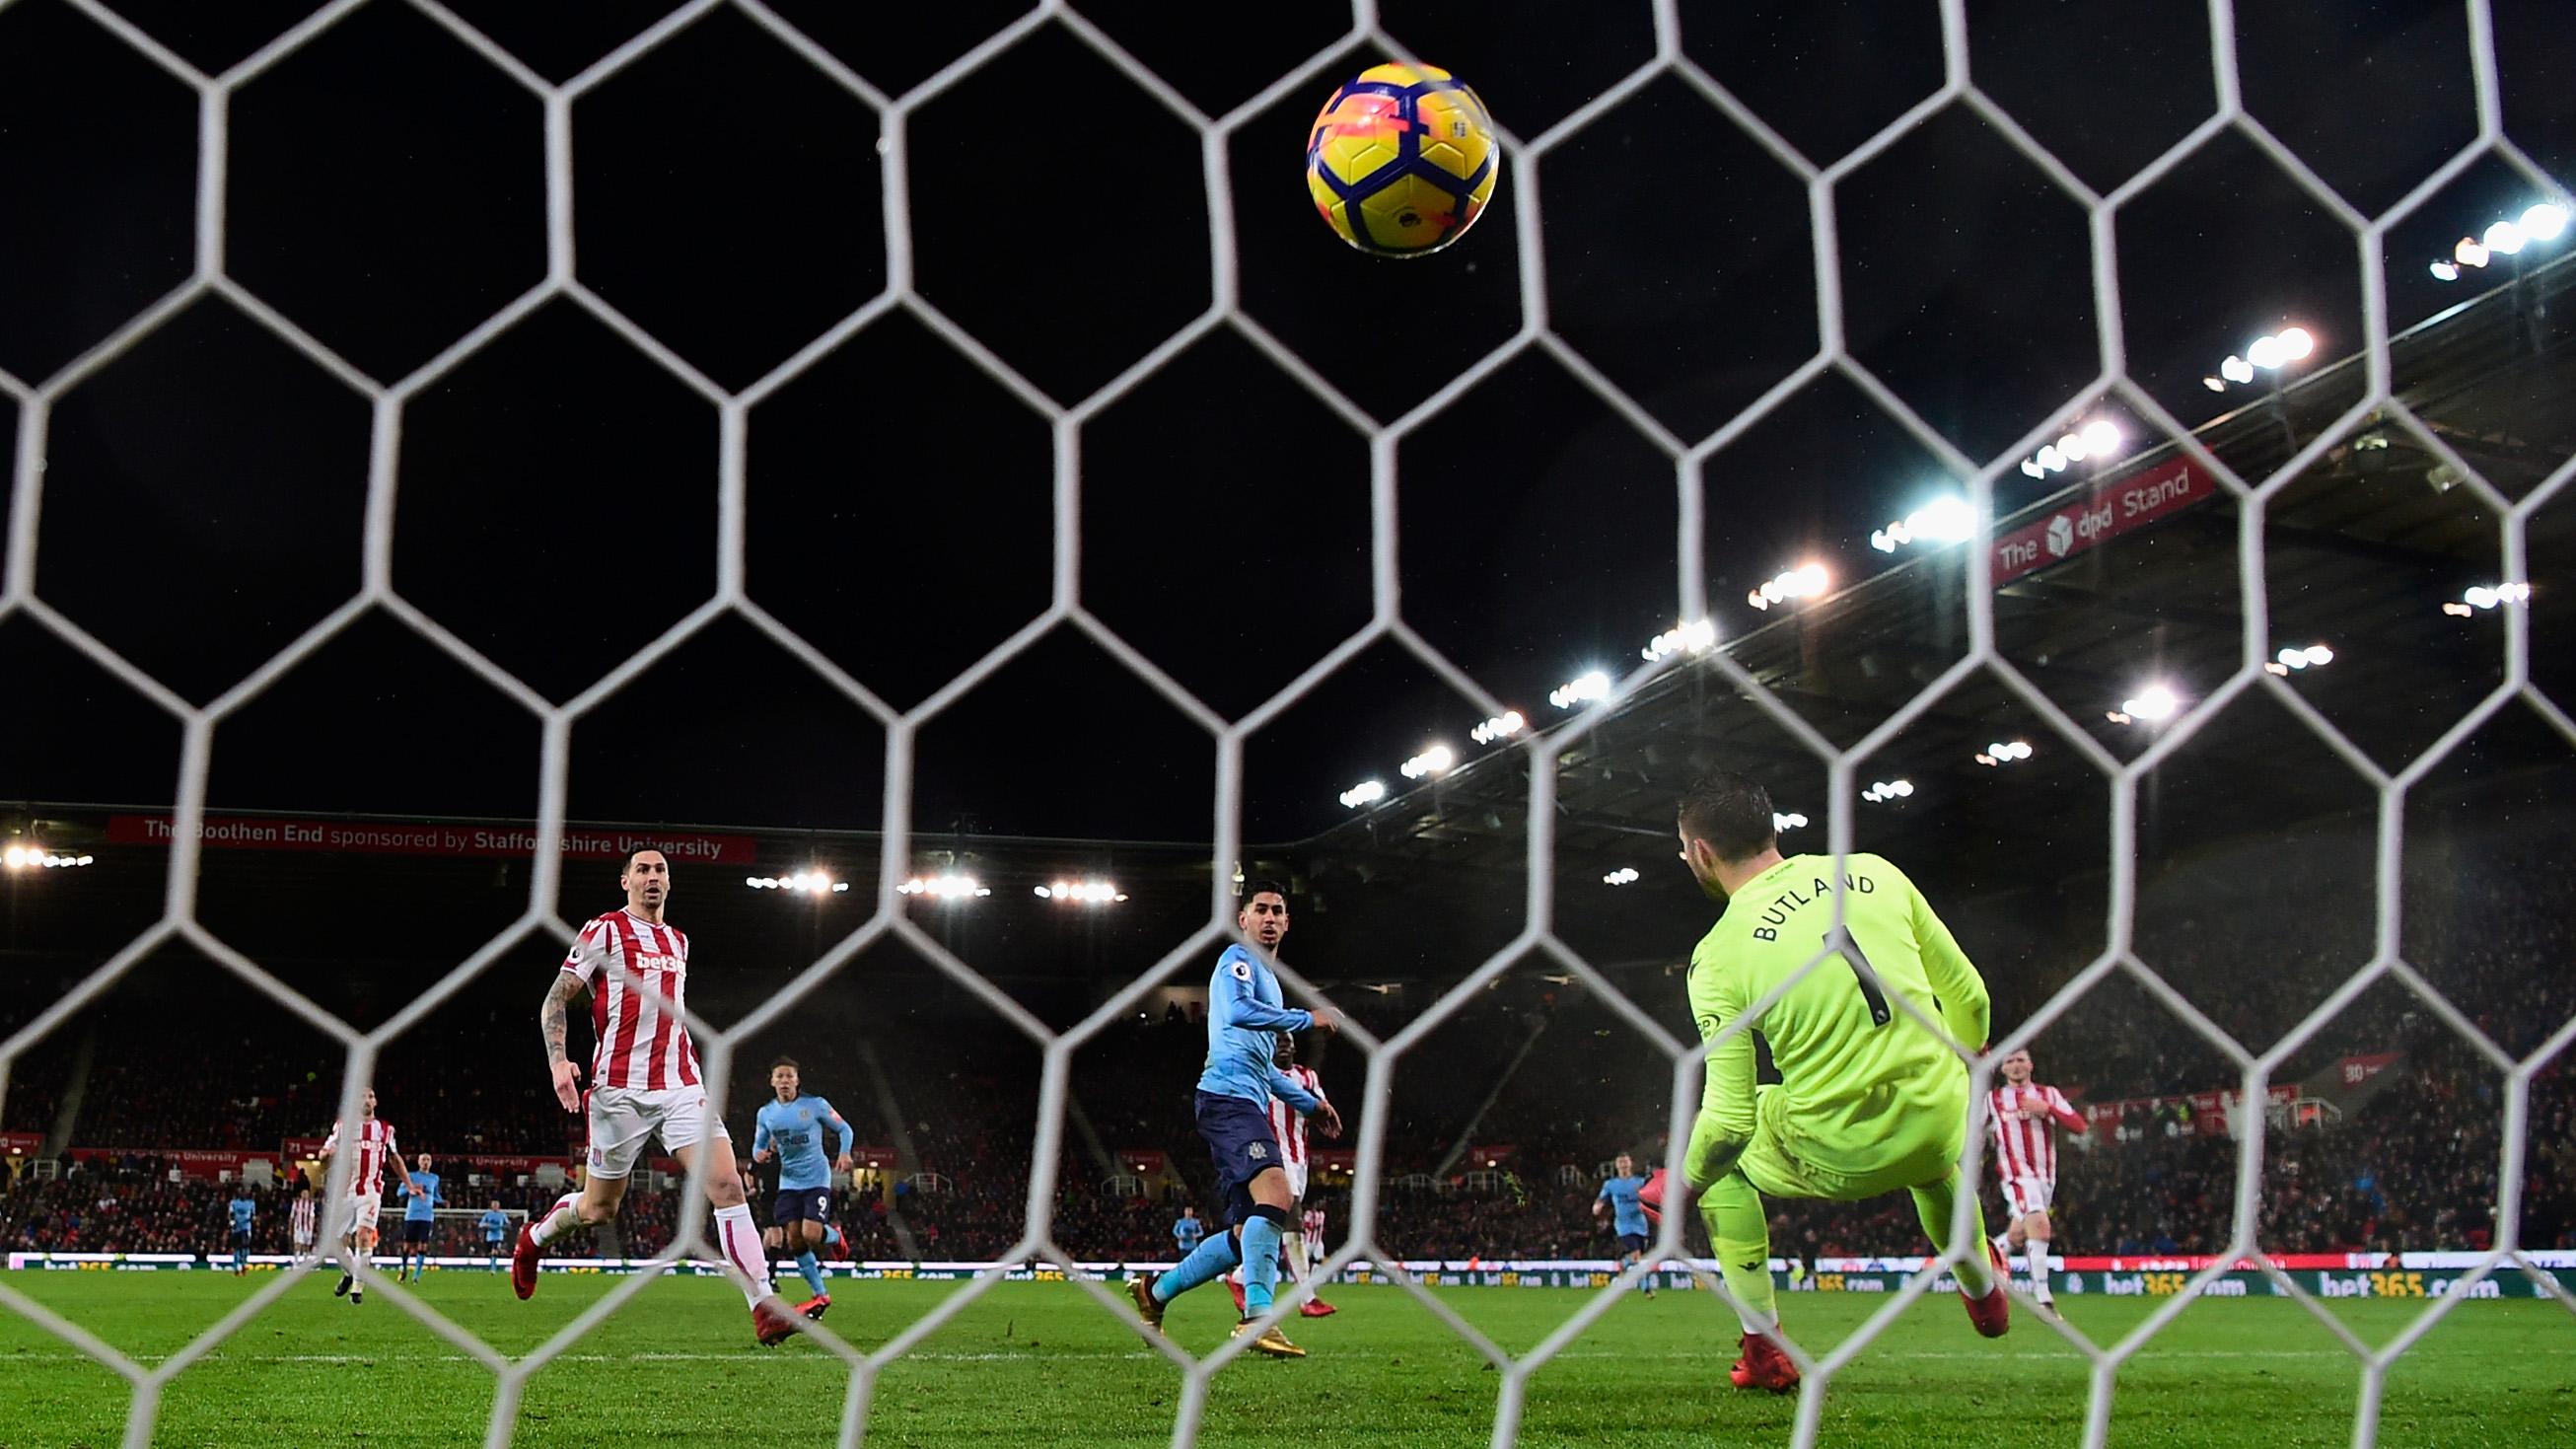 Stoke City v Newcastle United - Premier League